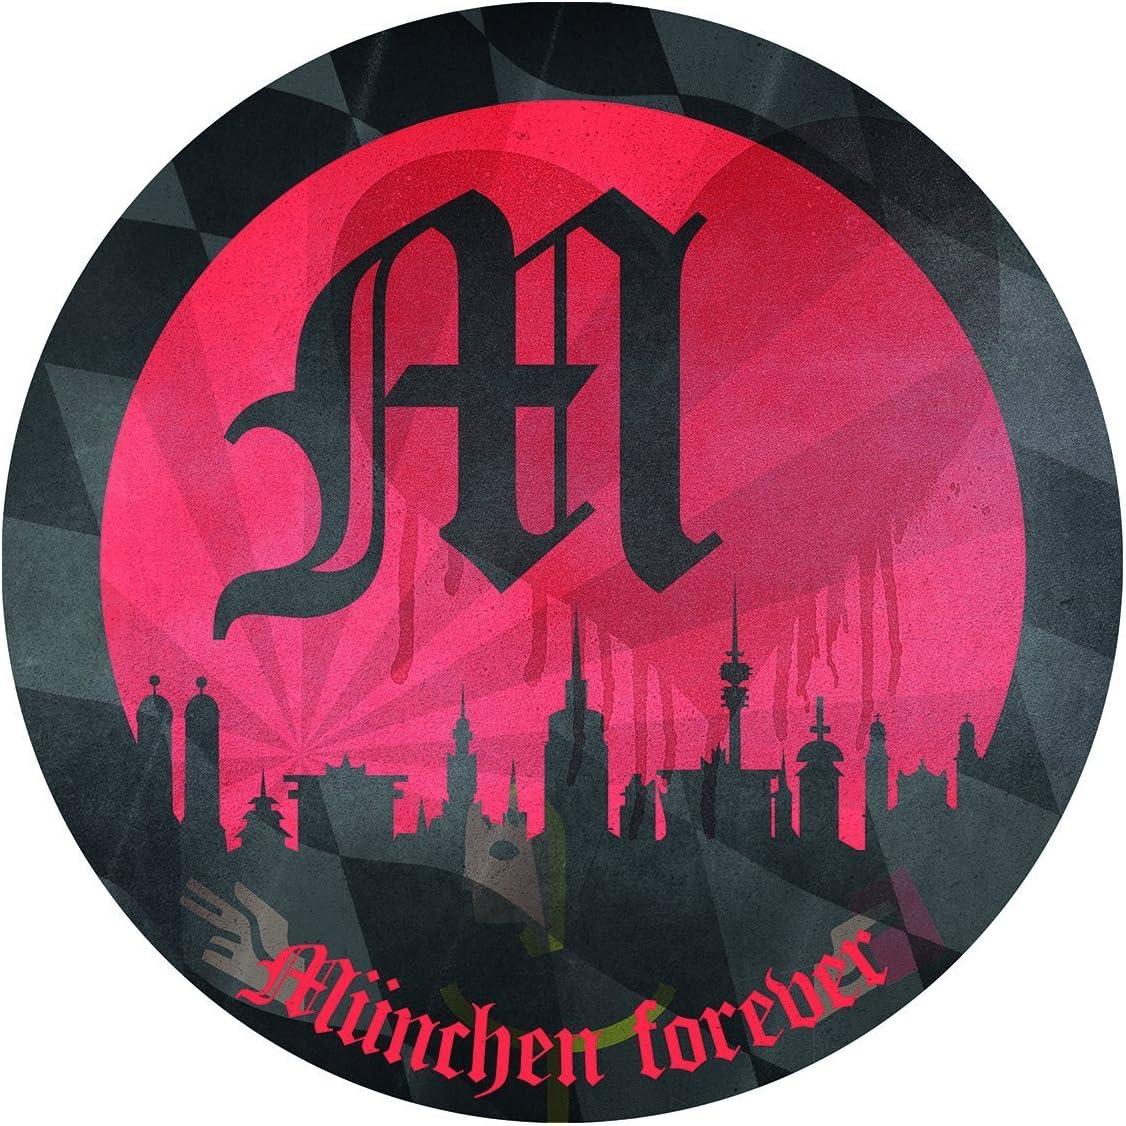 FC Bayern M/ünchen Autoaufkleber Aufkleber 3D Mia san mia FCB plus gratis Aufkleber forever M/ünchen Sticker